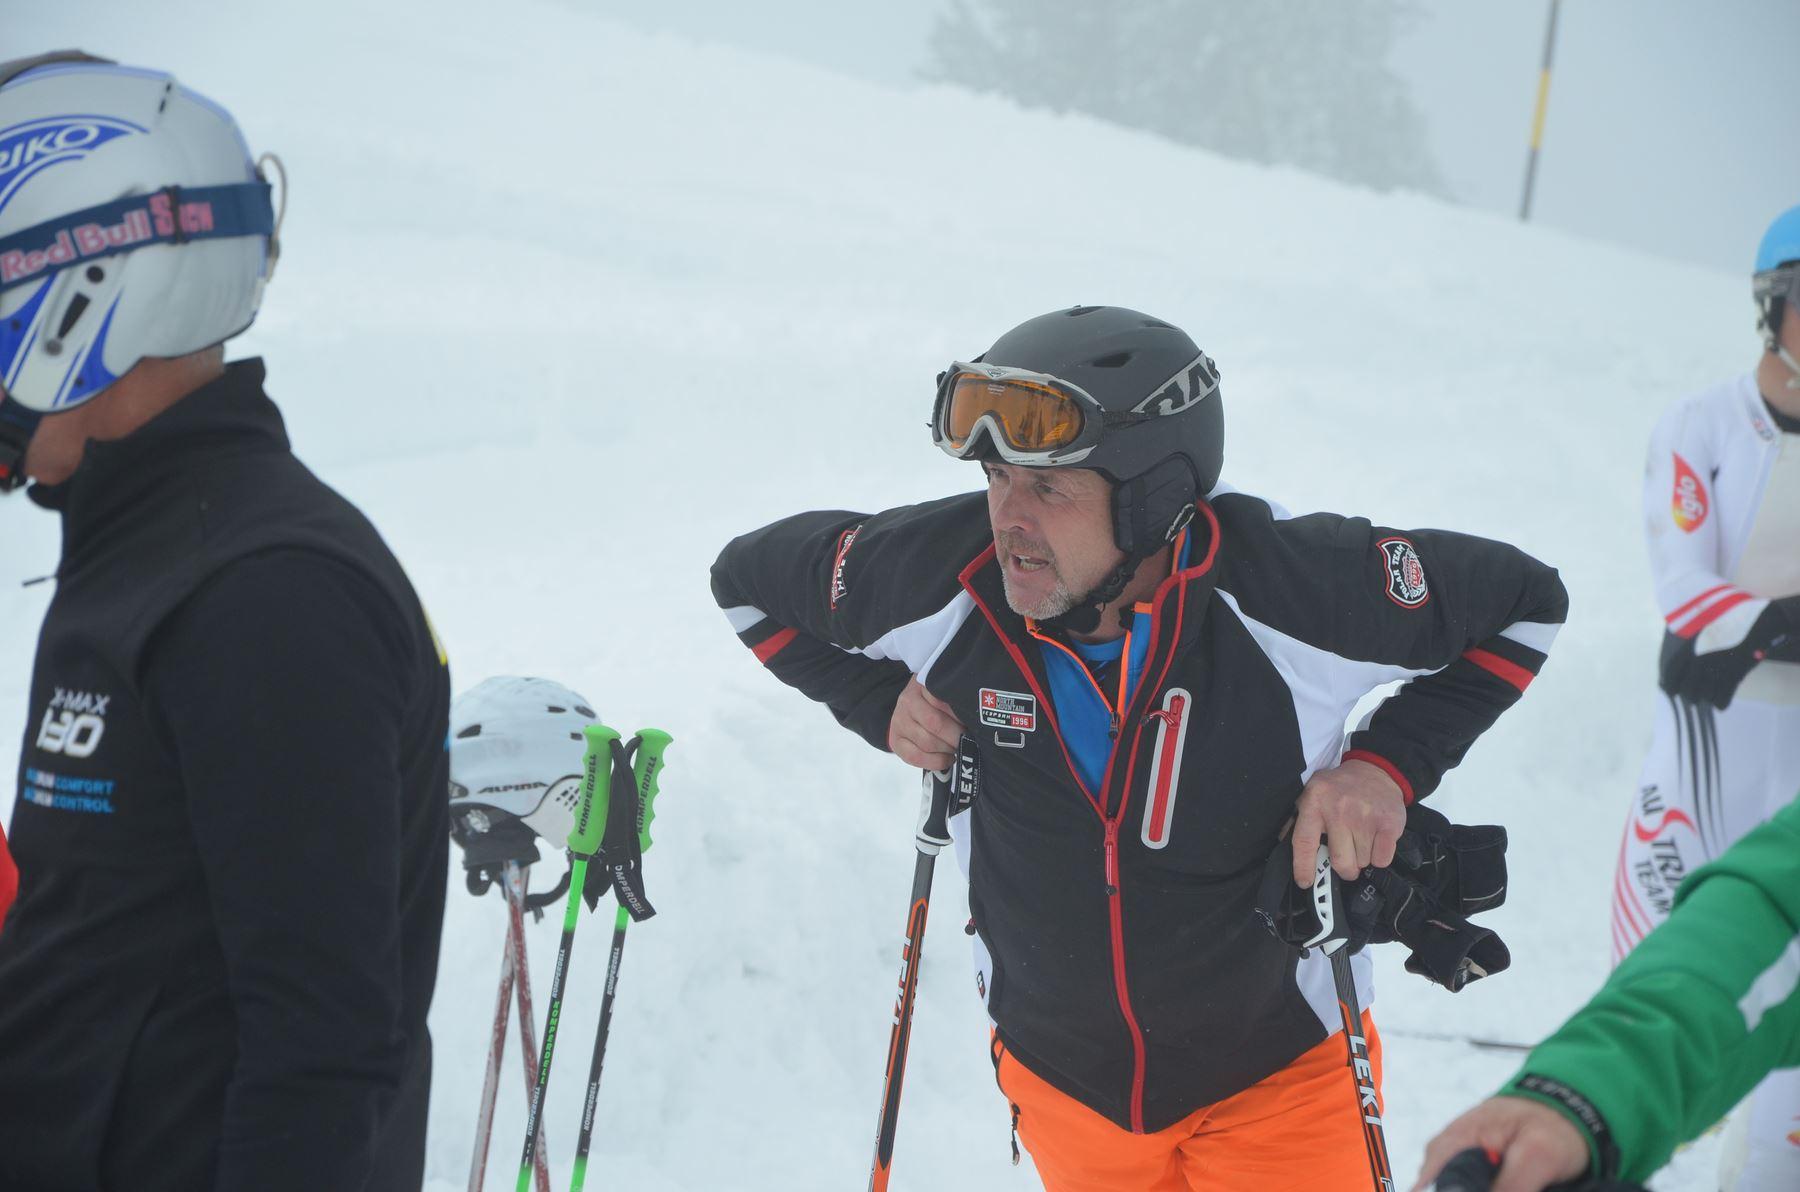 2015-03-22 BV Zillertal Skirennen 209.JPG